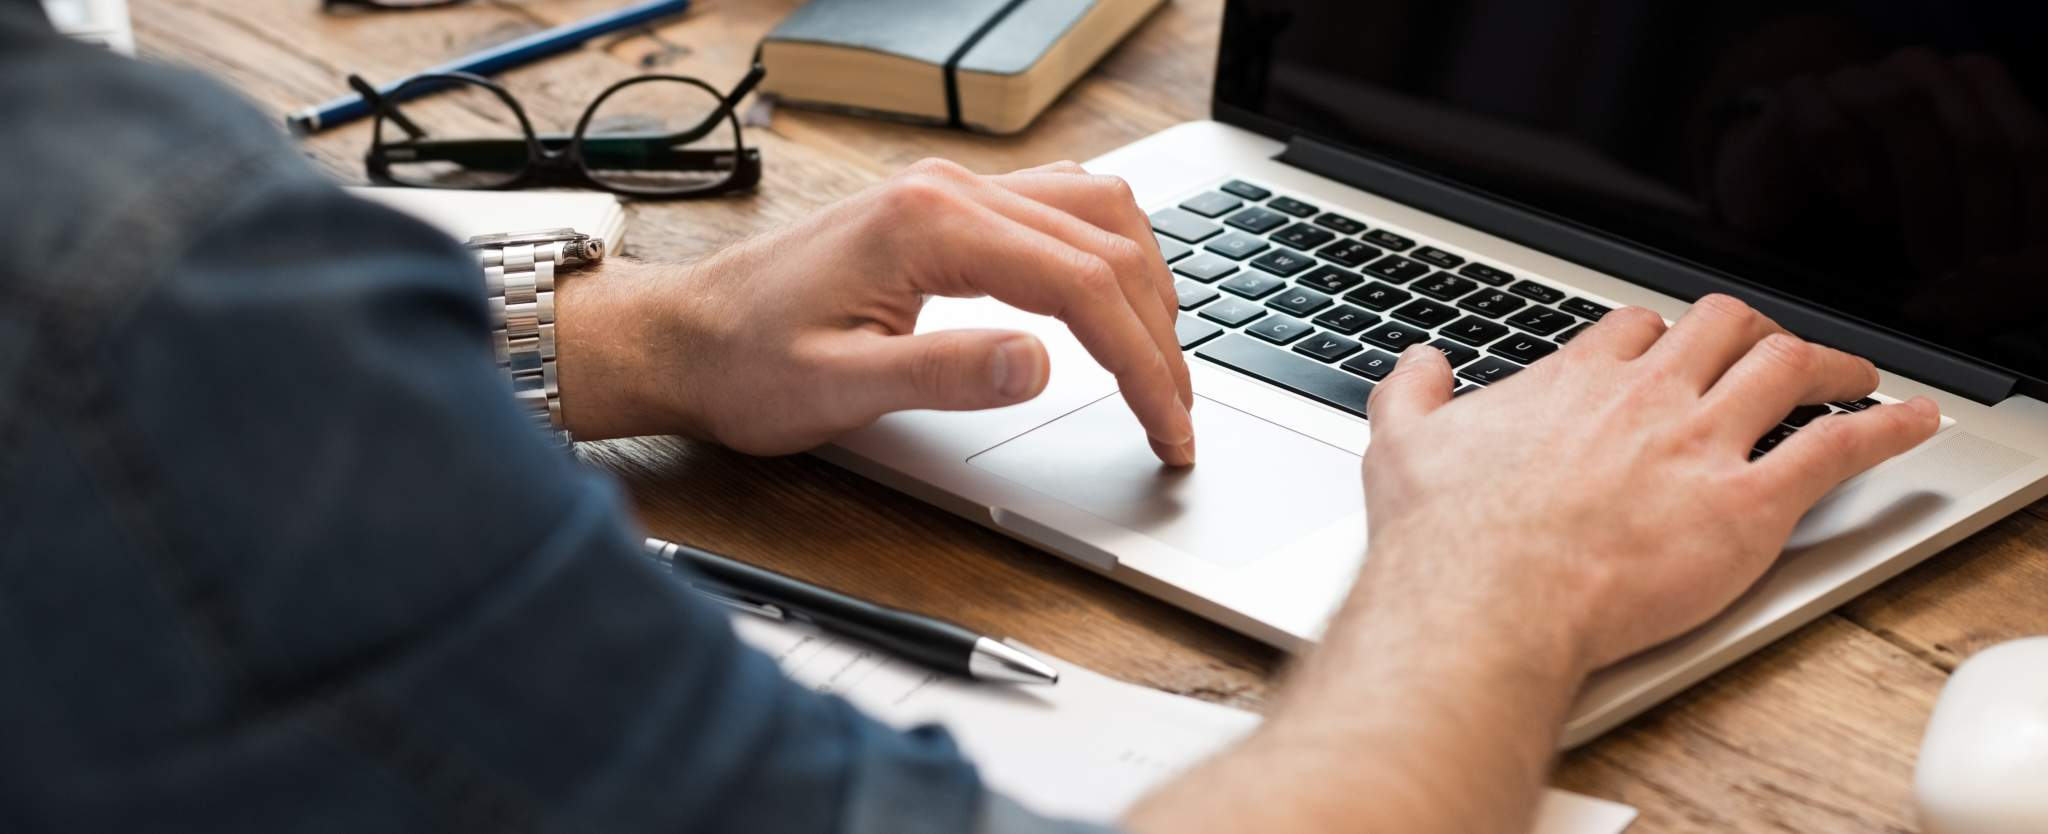 Microsoft Office Suite Training Course Radix Tree Online Tutoring